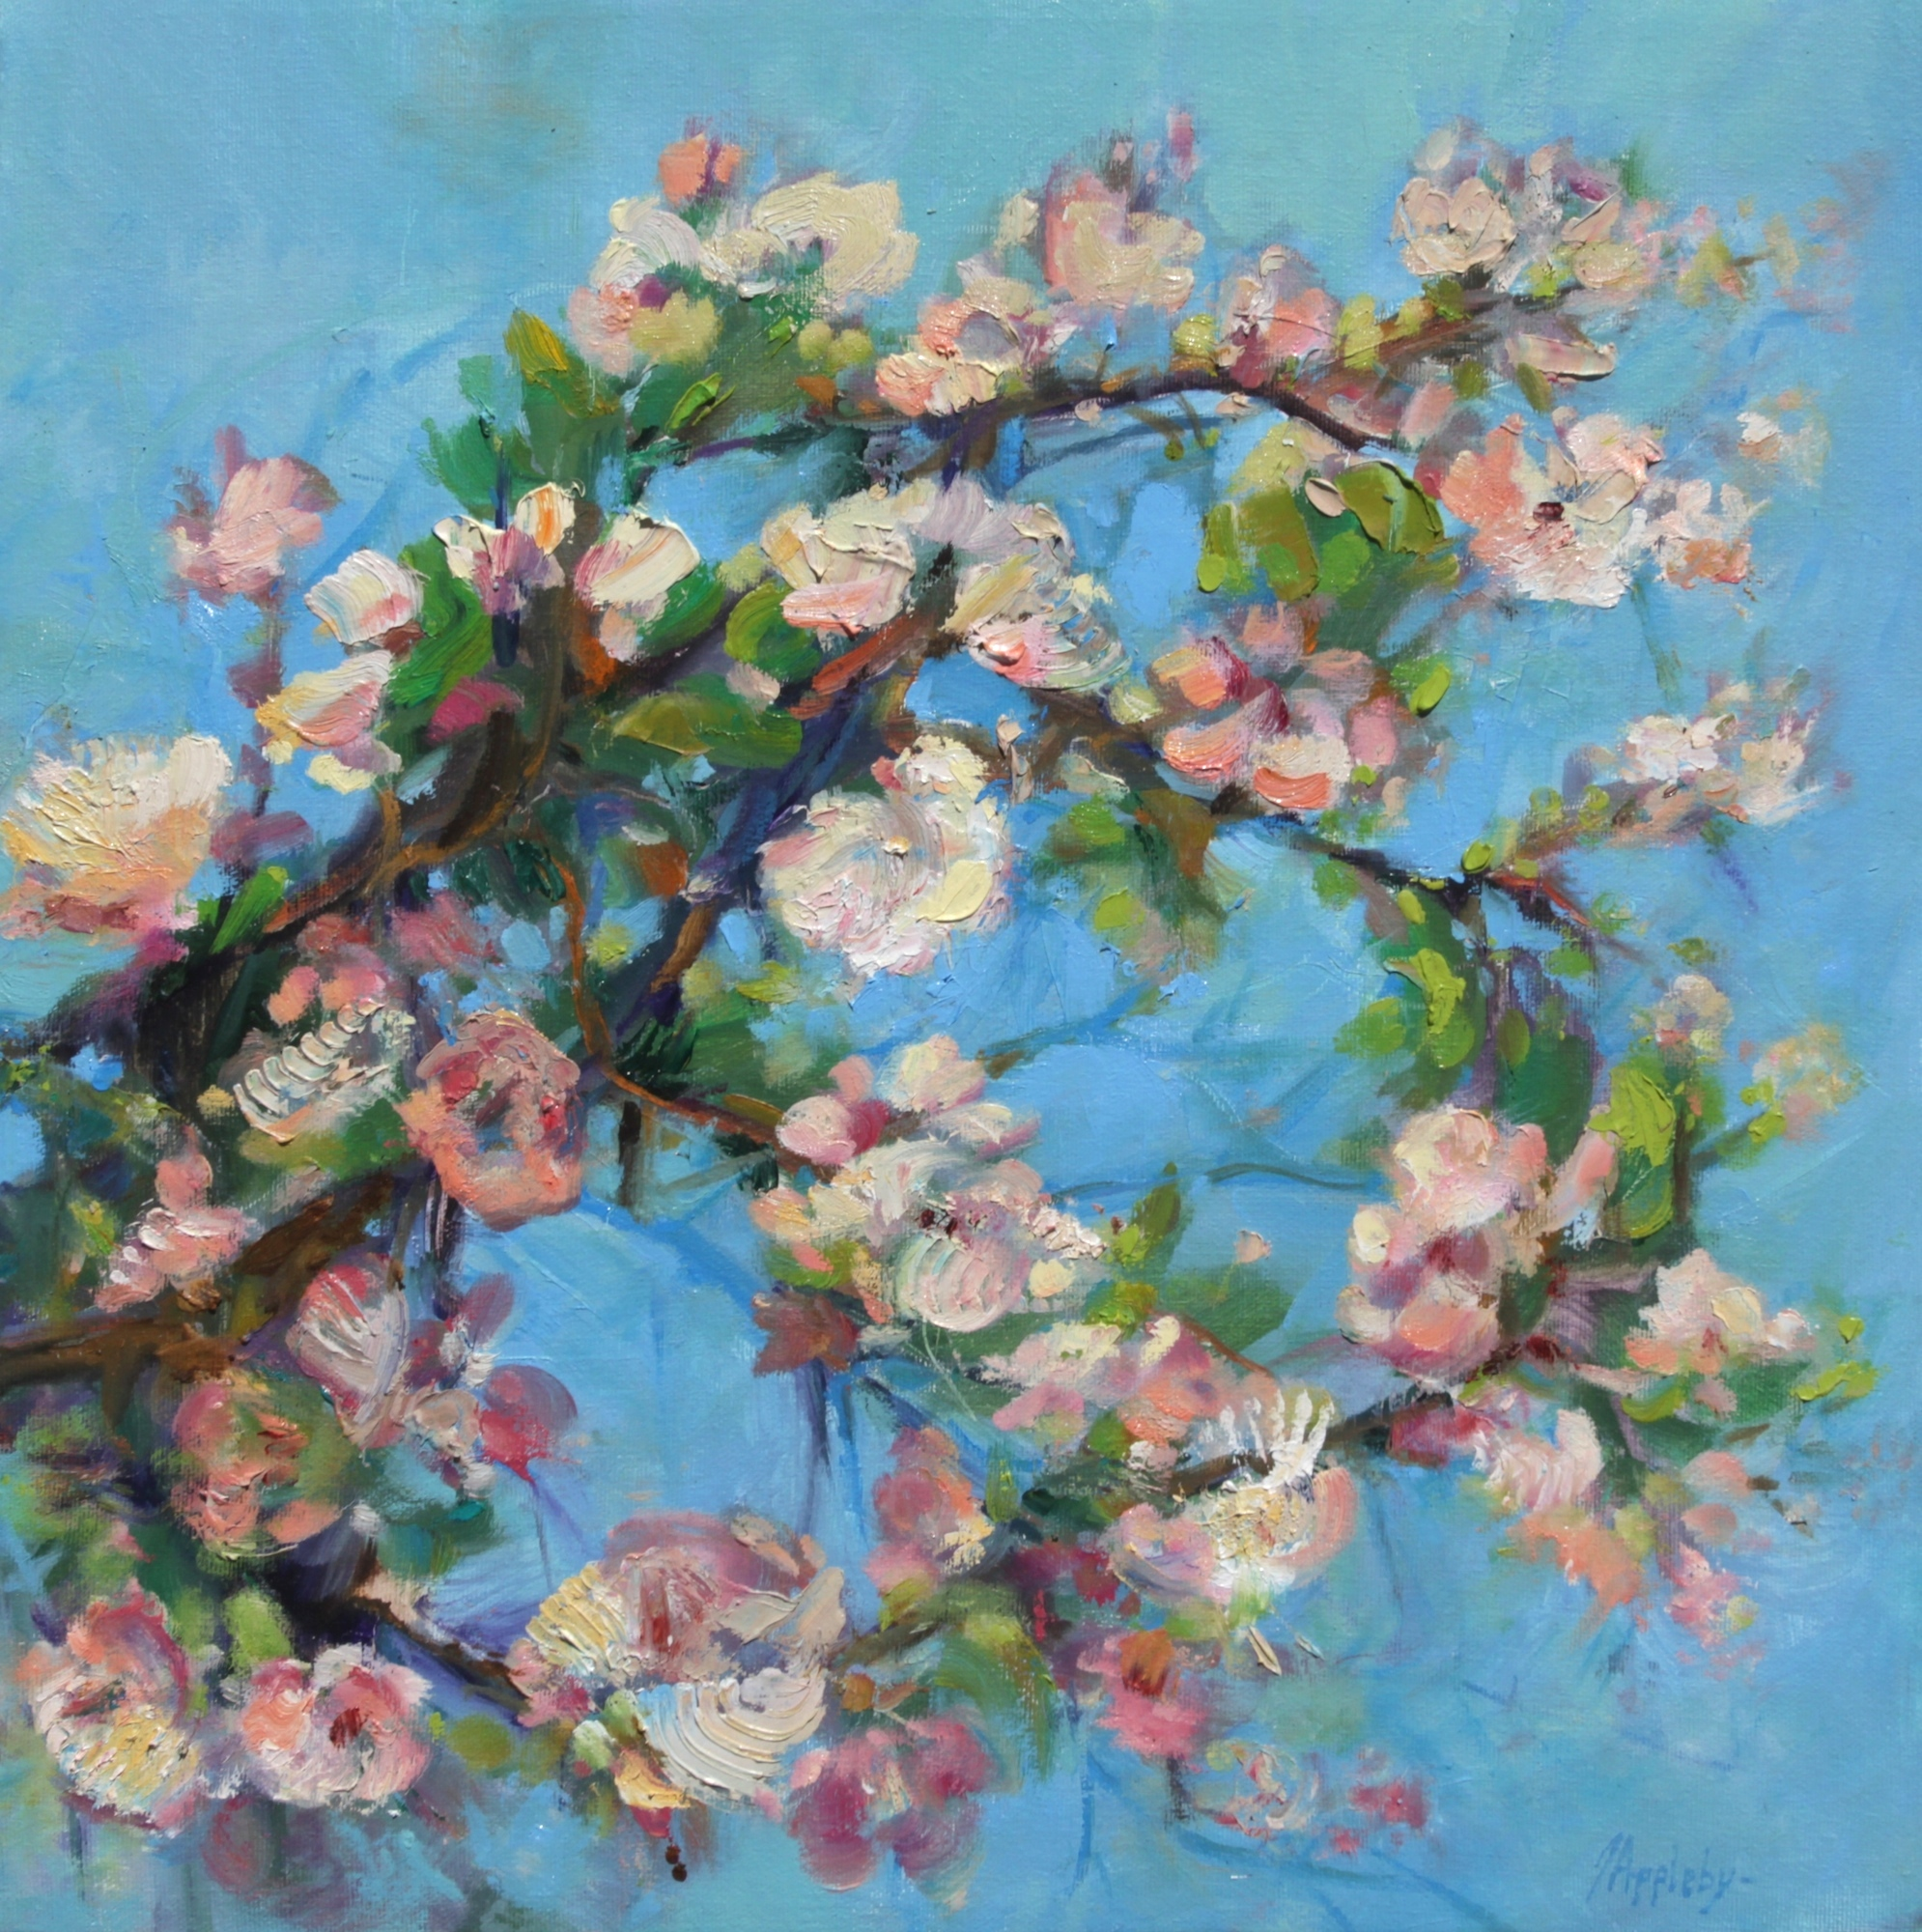 Flowers Jane Appleby